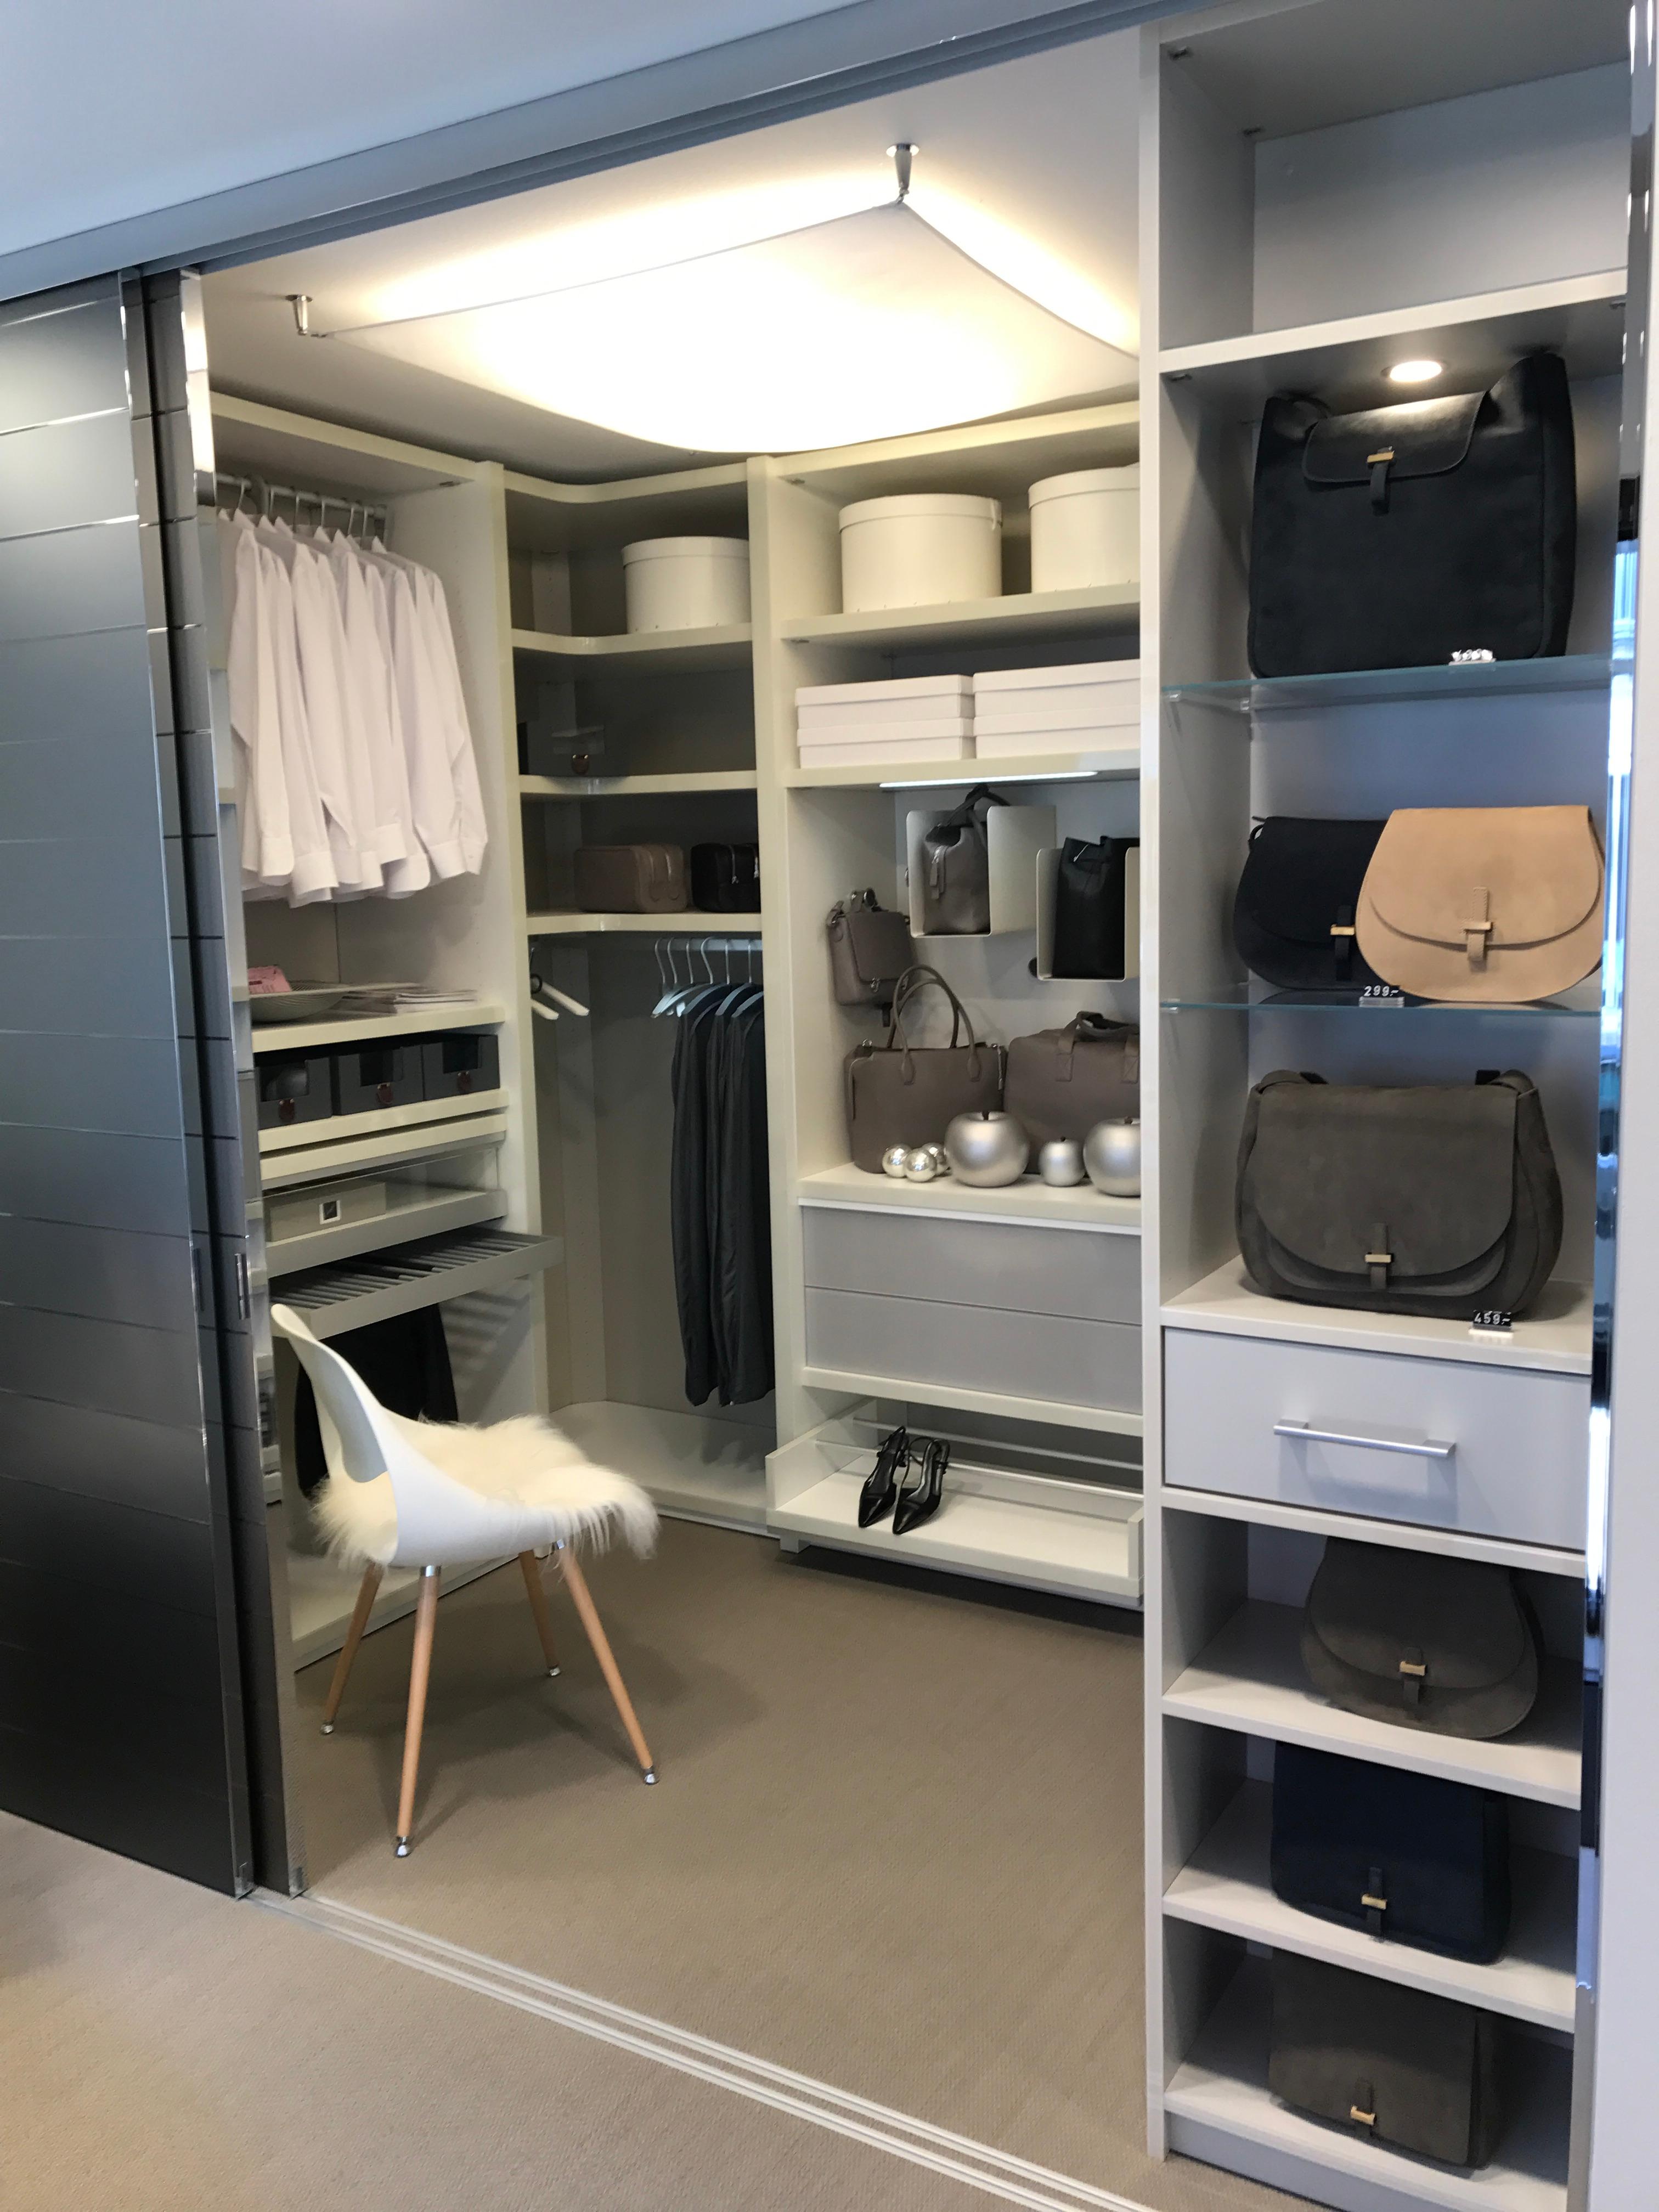 freiraum iris bothe e k ffnungszeiten freiraum iris bothe e k karmelitenstra e. Black Bedroom Furniture Sets. Home Design Ideas